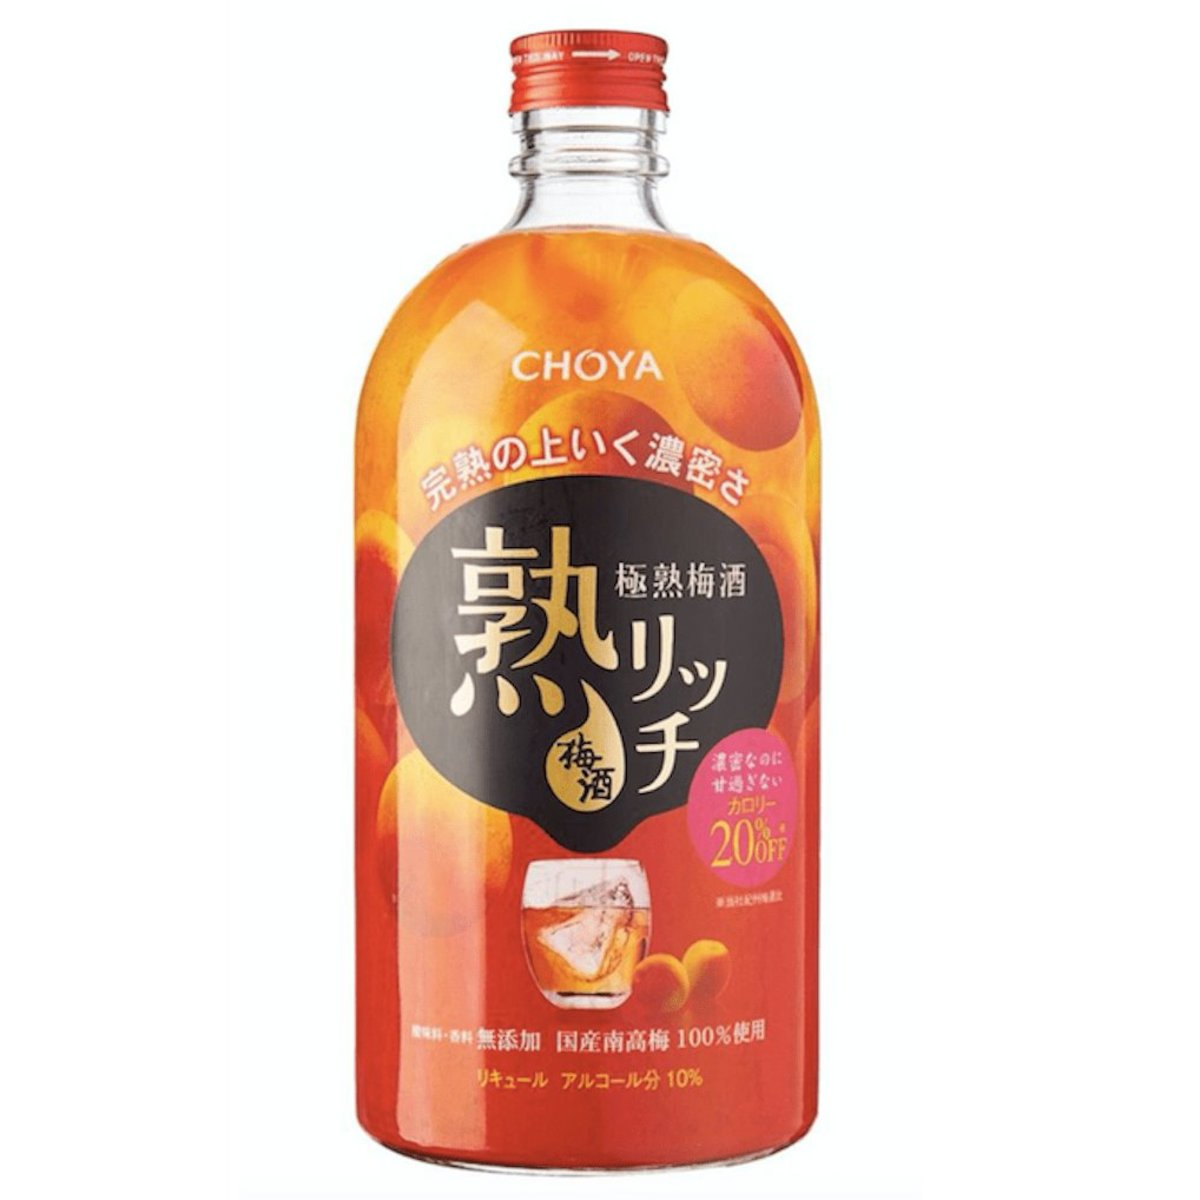 100% 完熟梅酒 720ml (4905846119878)